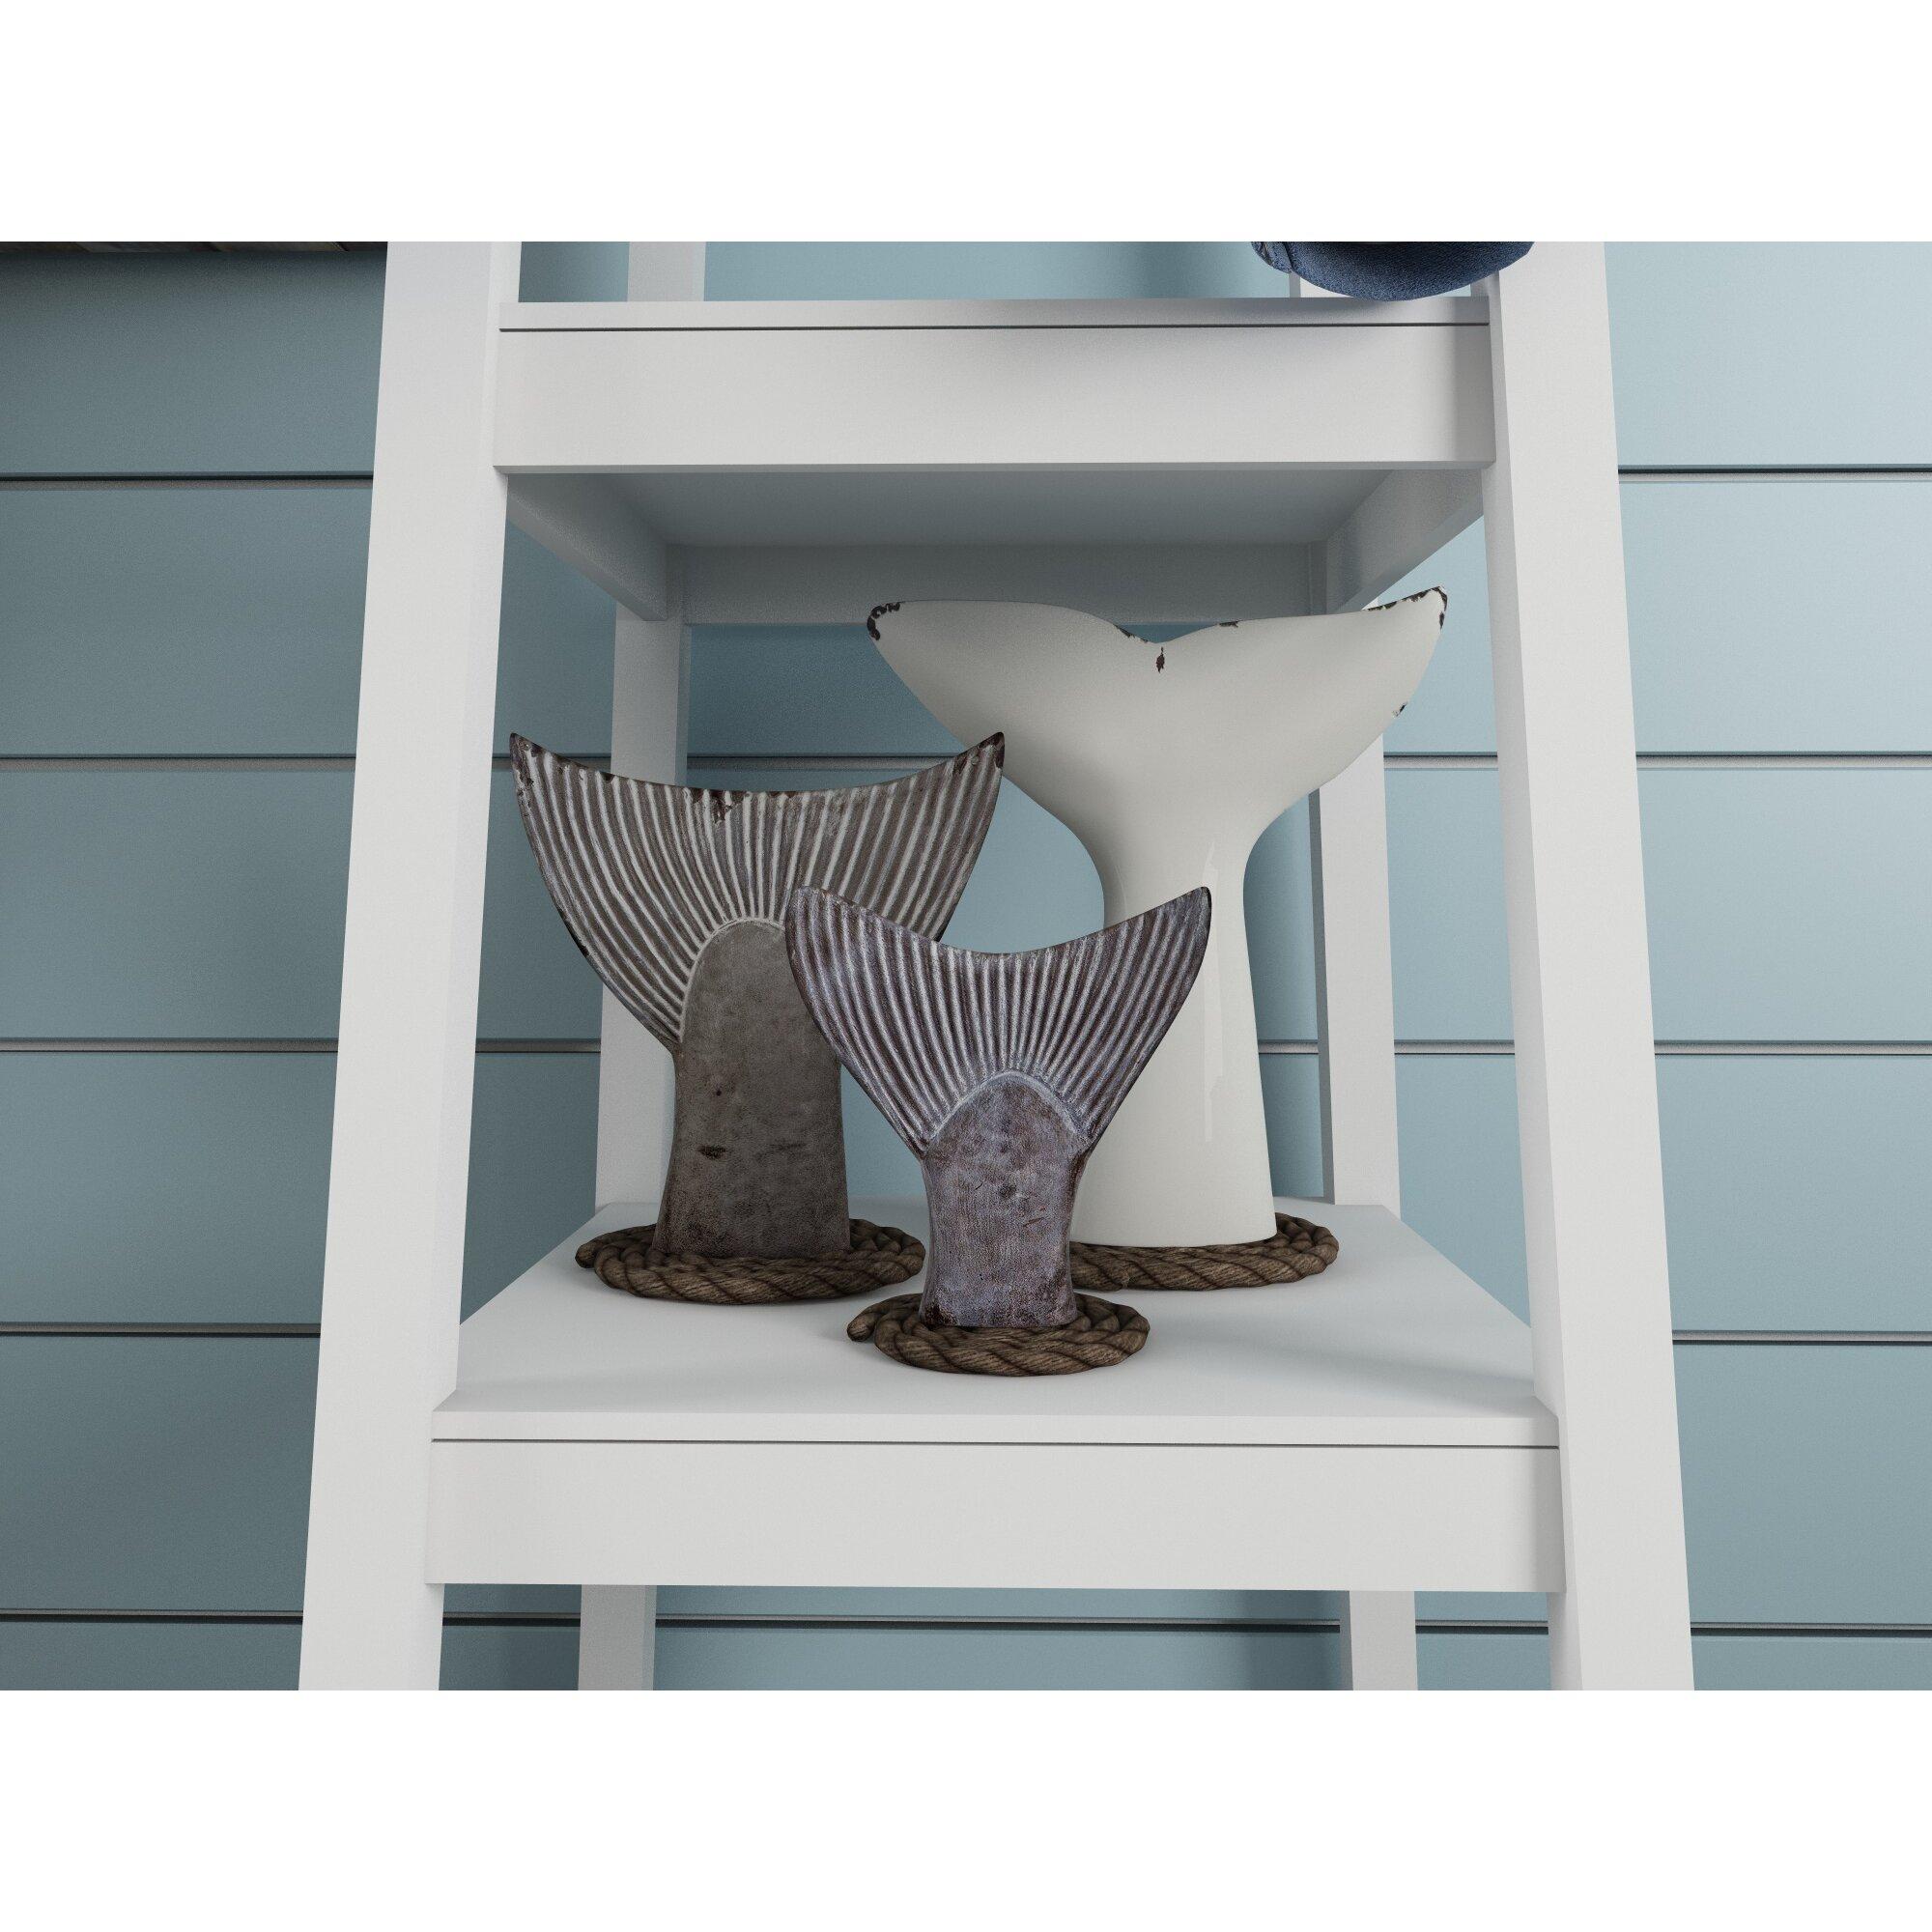 3 Piece Utensil Wall Décor Set : Breakwater bay seaworthy piece fish tail wall decor set